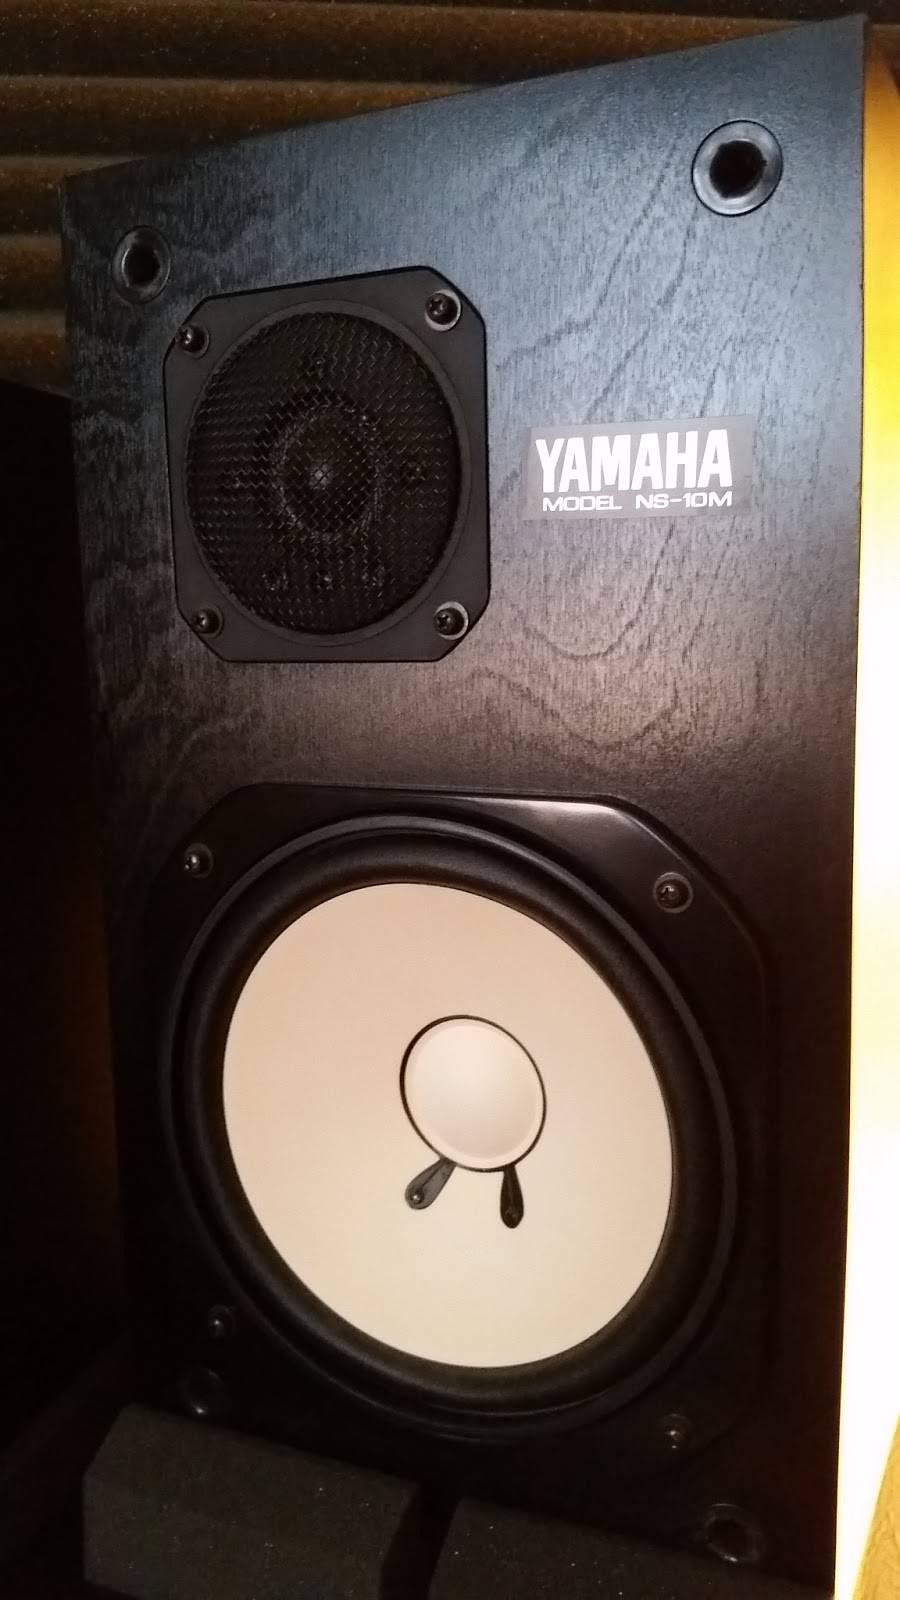 Anthem Recording Studio - electronics store  | Photo 8 of 10 | Address: Plano, TX 75074, USA | Phone: (972) 836-8939